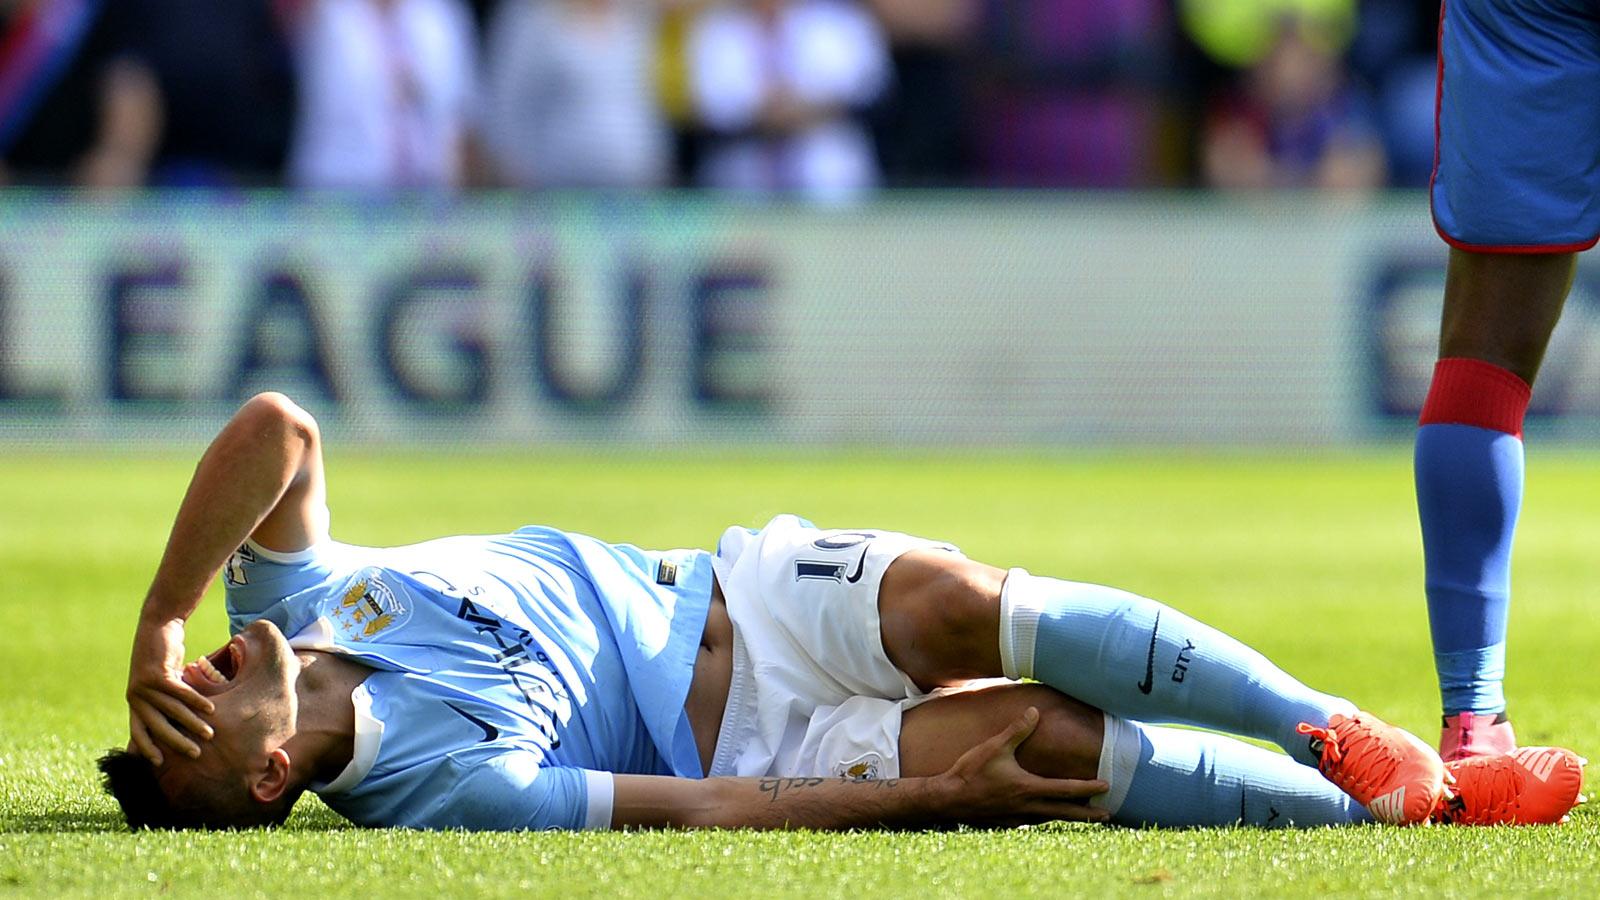 City boss Pellegrini confirms Aguero will miss Juventus clash